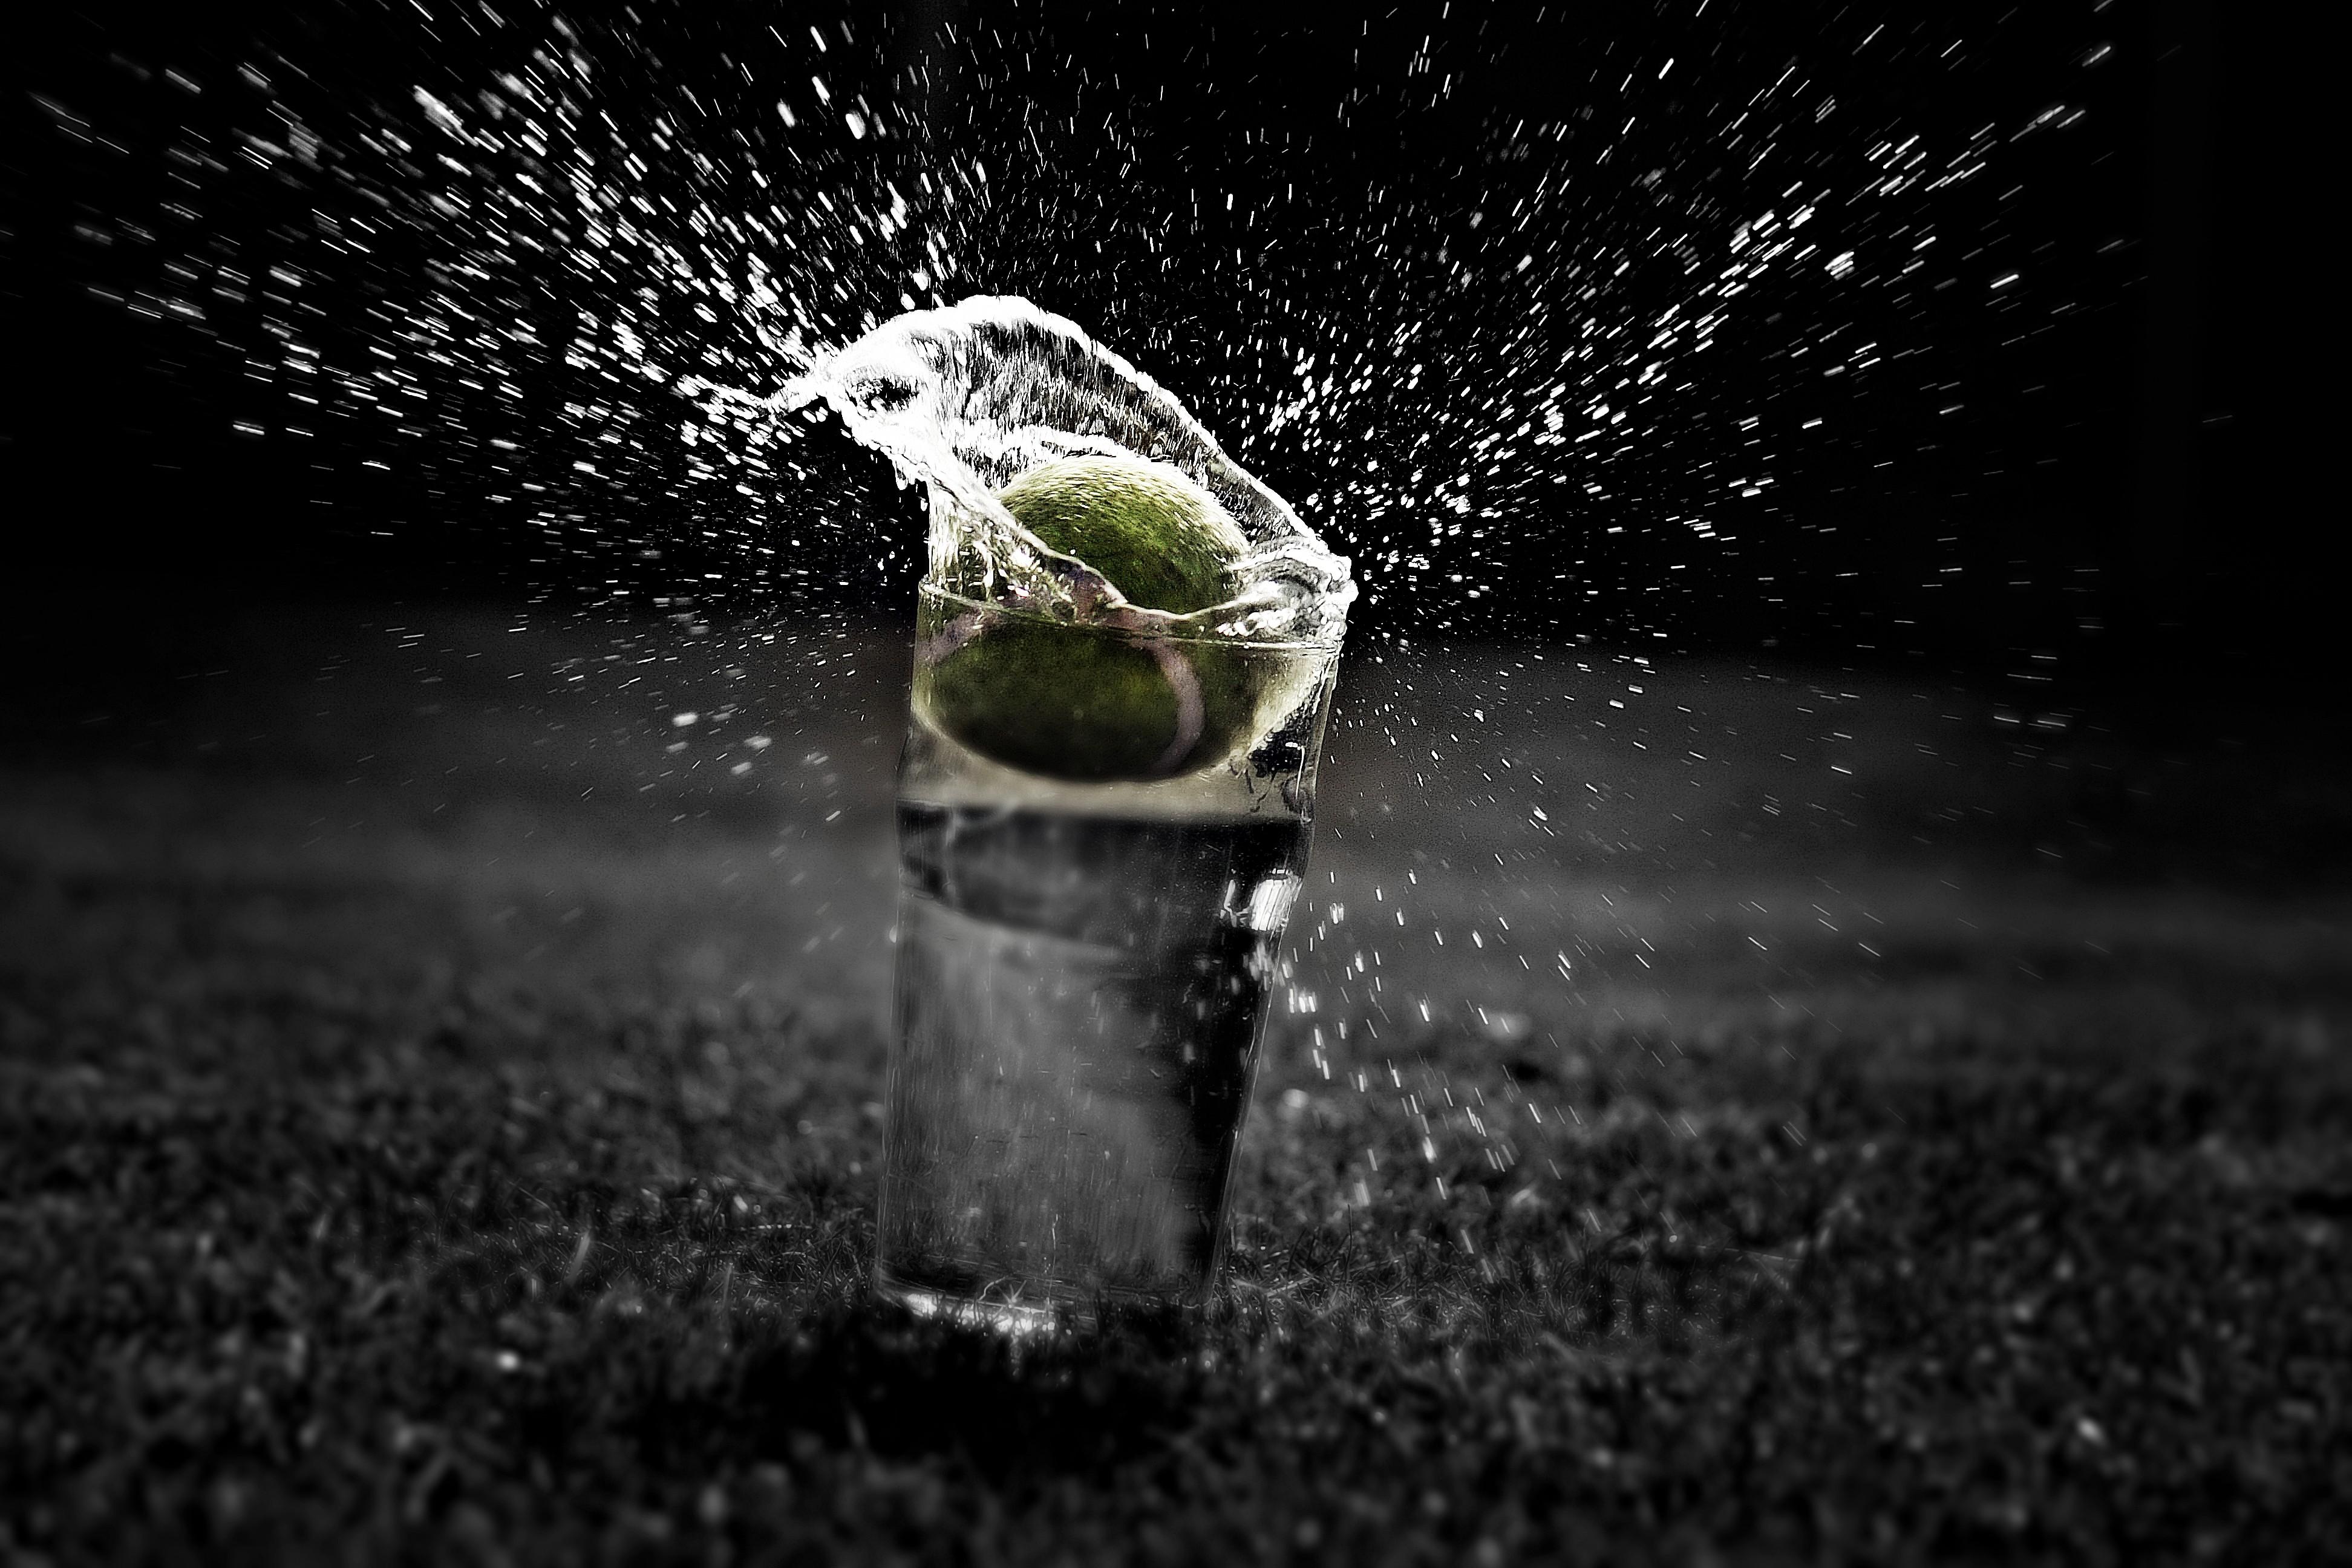 Tennis Sunlight Black Monochrome Night Water Reflection Photography Green Splashes Balls Light Weather Darkness 3888x2592